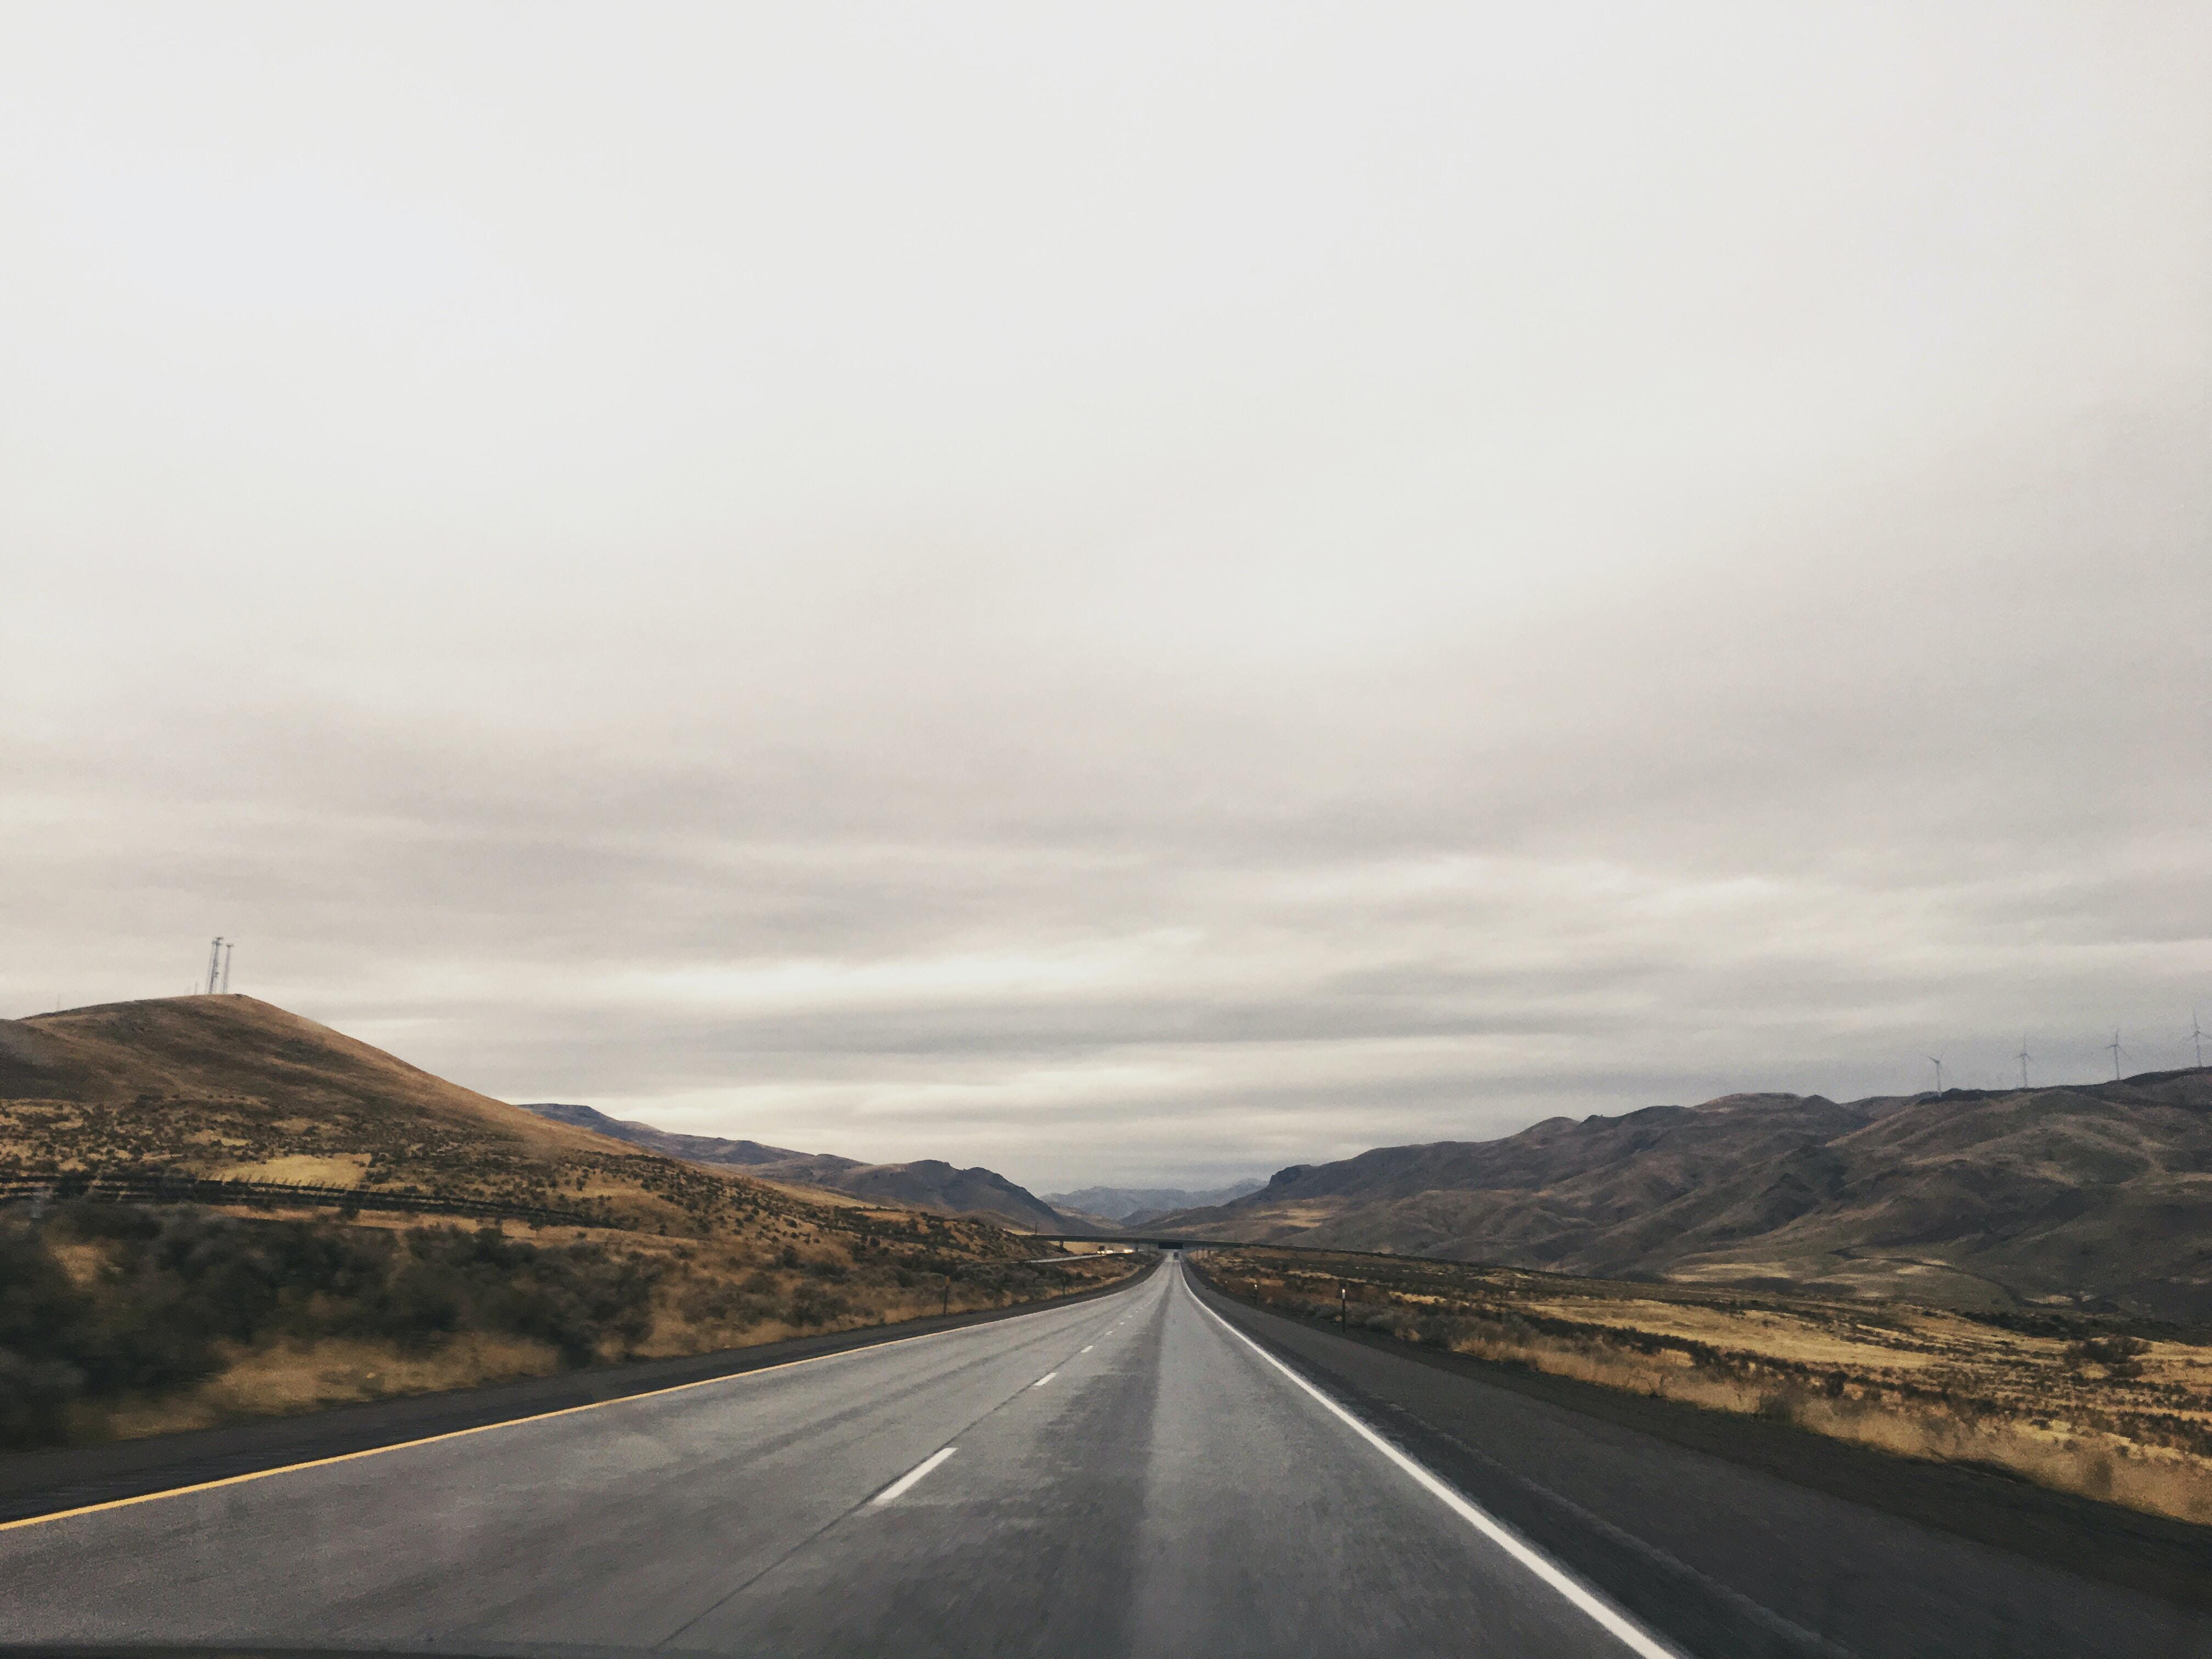 gray asphalt road in between trees at daytime